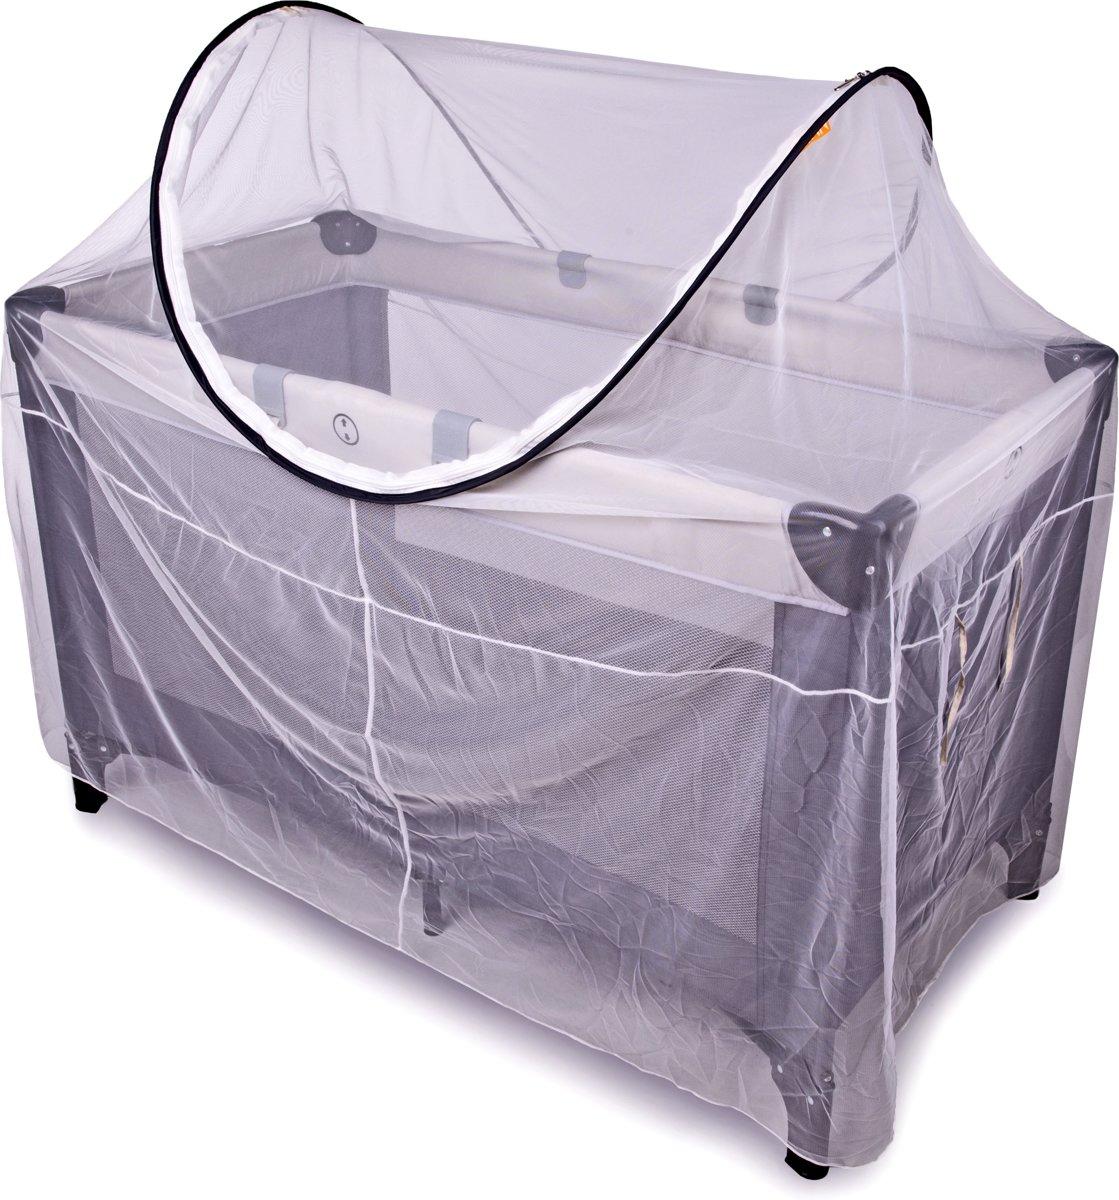 Deryan Luxe Campingbed klamboe - mosquito protector